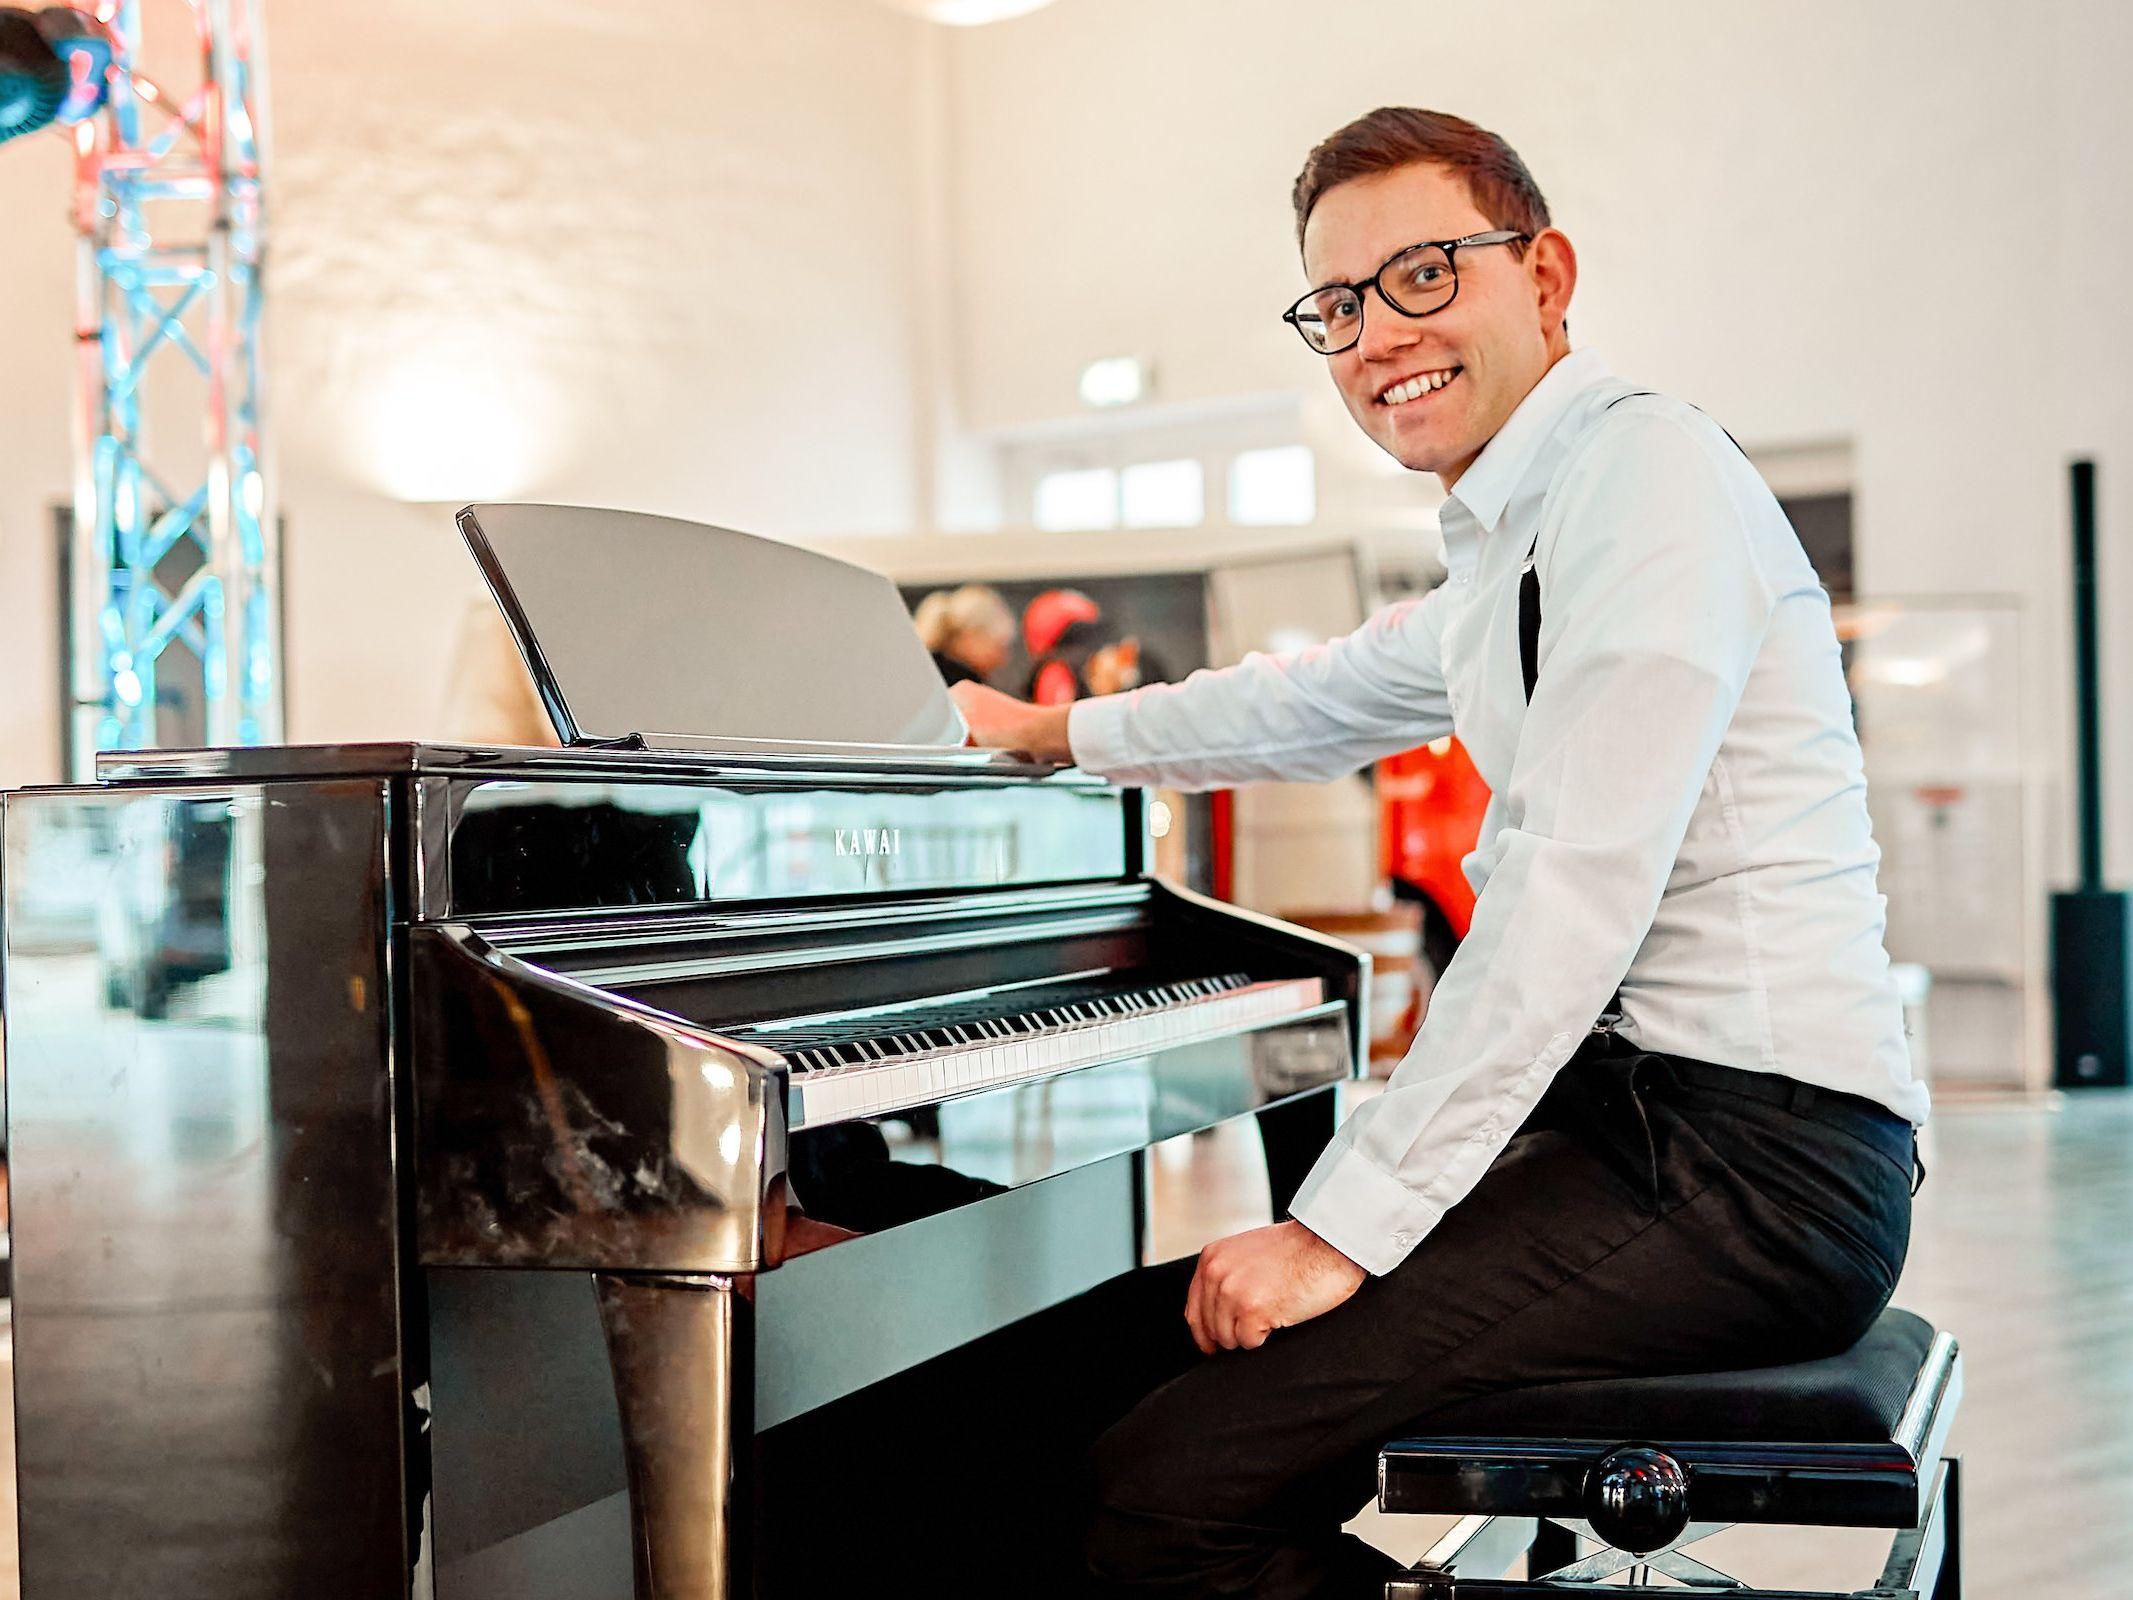 Pianist | Klavierspieler | Barpiano | Barpianist | Hannover | Trauung | Hochzeit | Empfang | Sektempfang | Dinner | Kirche | Buchen | Mieten | Anfragen | Alexander | Barsch | Lehmann | Eventservice